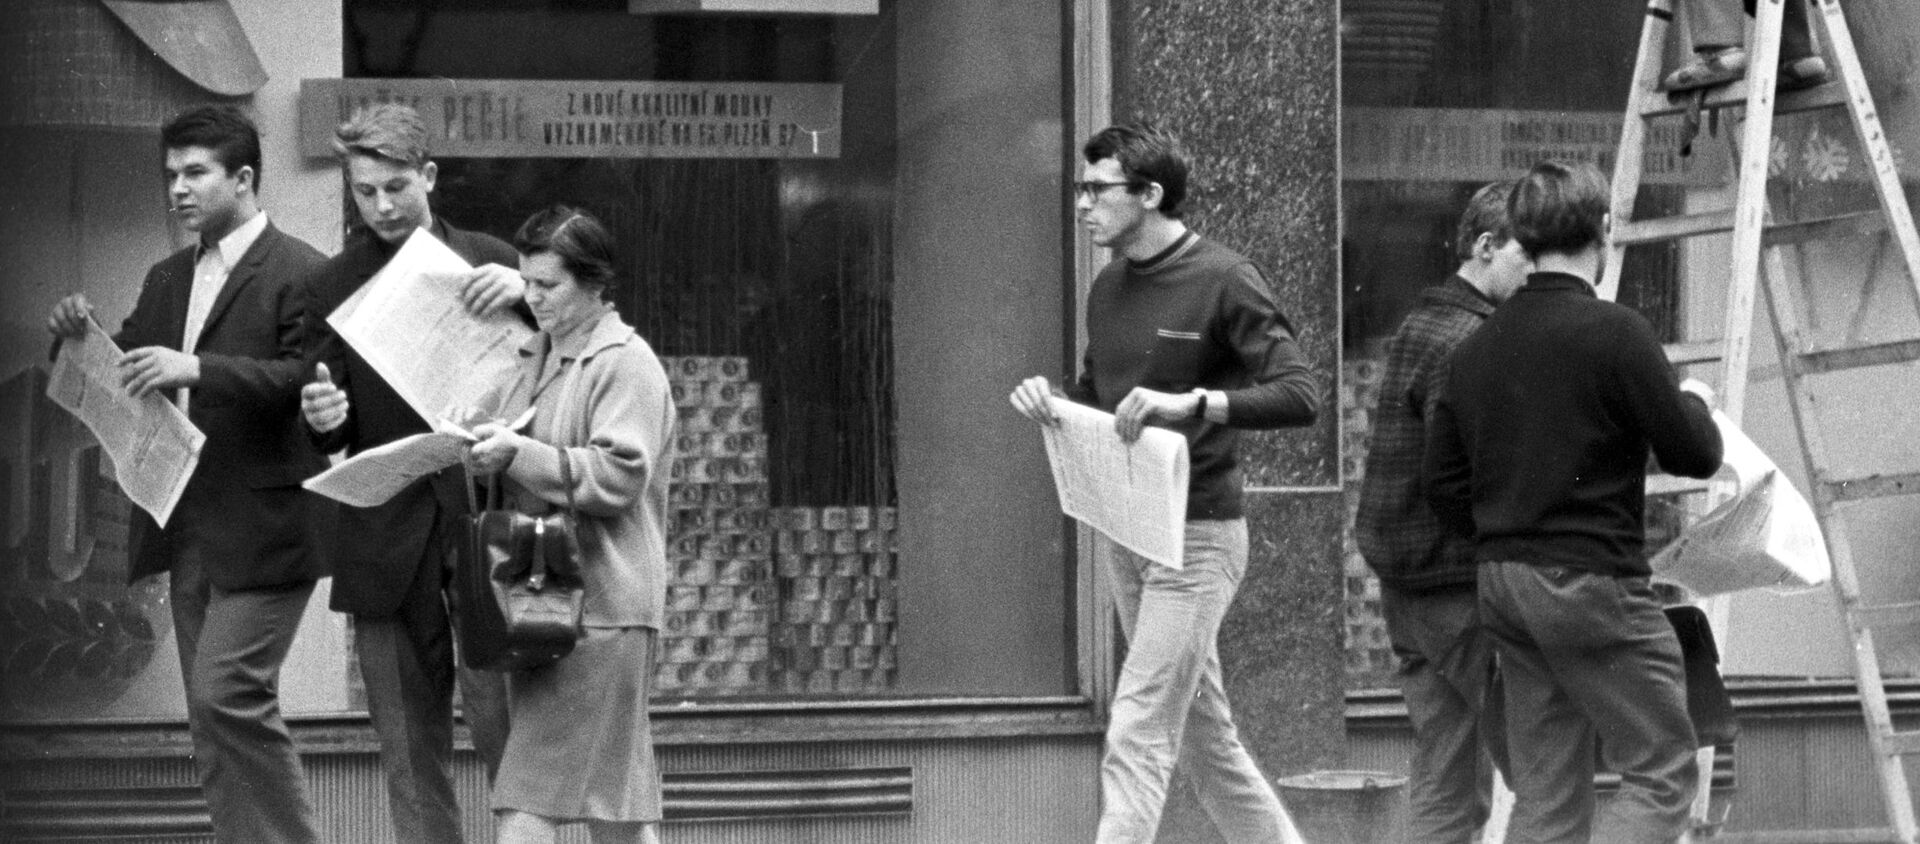 На улицах Праги, 1968 год  - Sputnik Česká republika, 1920, 25.08.2020